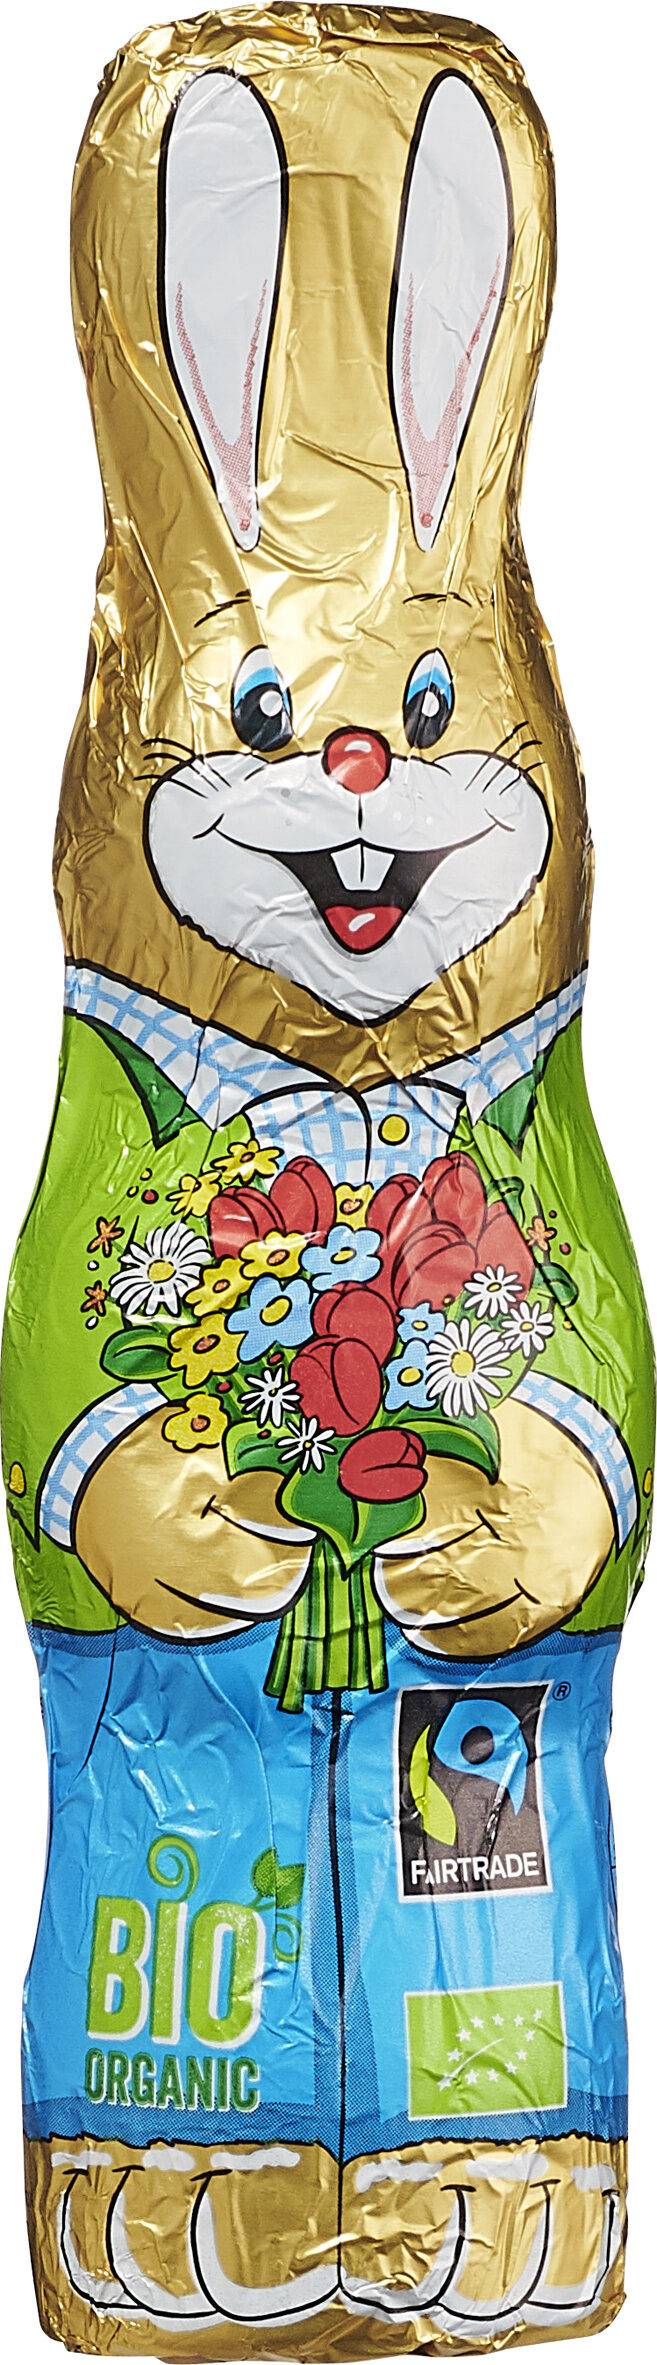 Lapin chocolat lait - Prodotto - fr